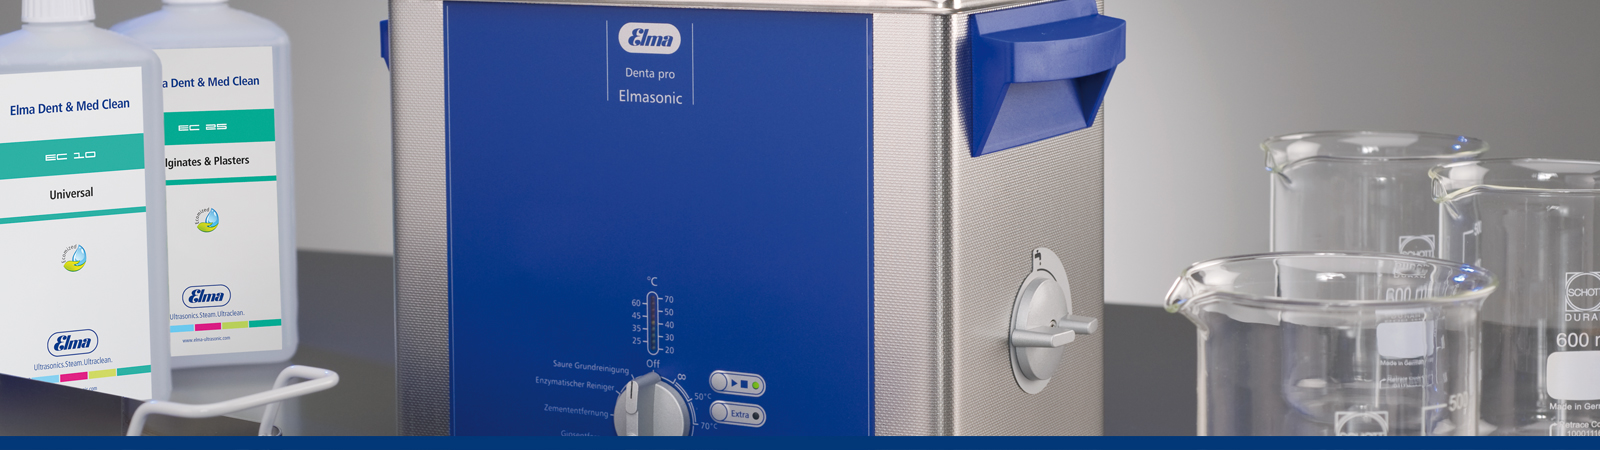 elmasonicdentapro-edmc-de-1600x450A4812820-674A-9099-4D10-E45CA362212A.jpg